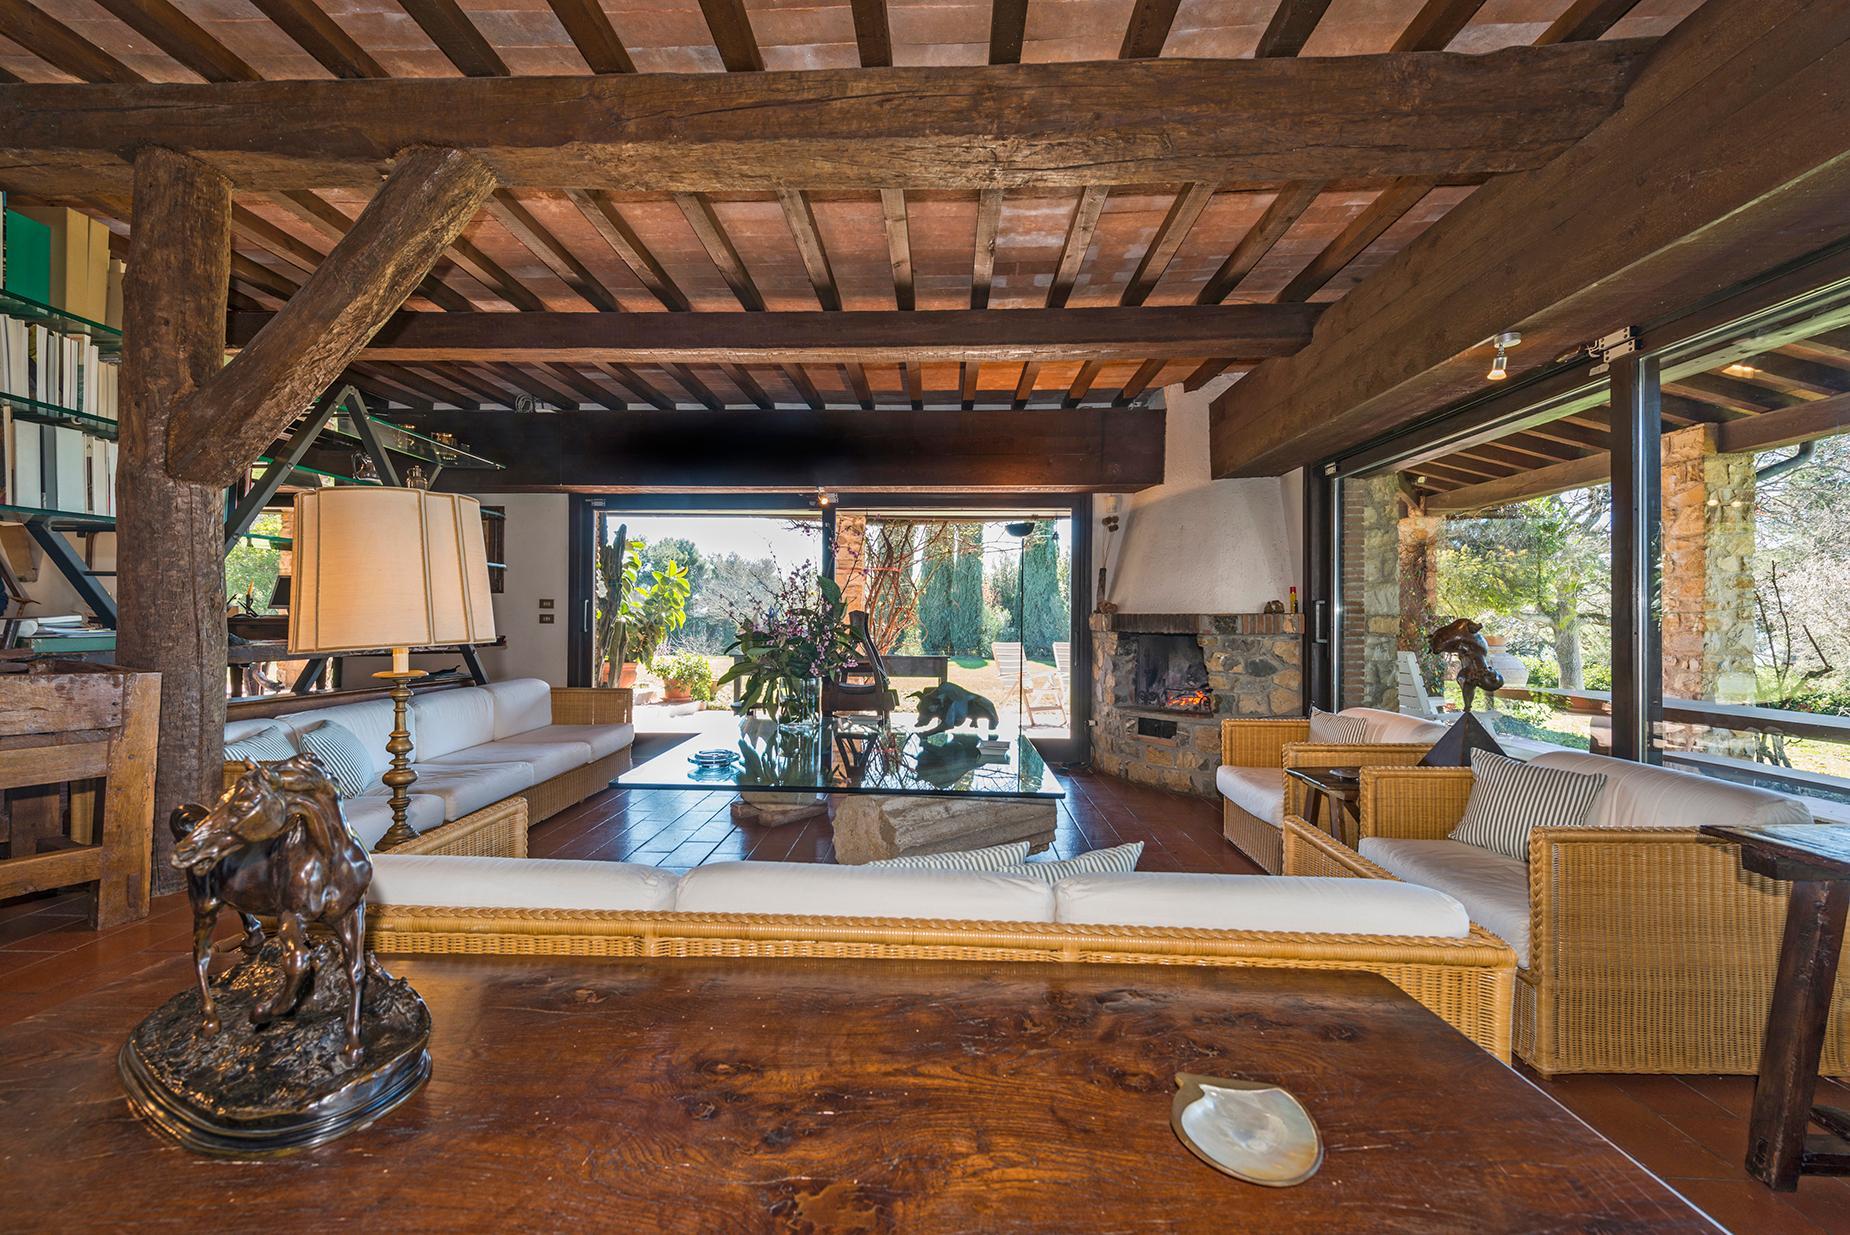 Splendida villa con viste mozzafiato del Monte Argentario - 8